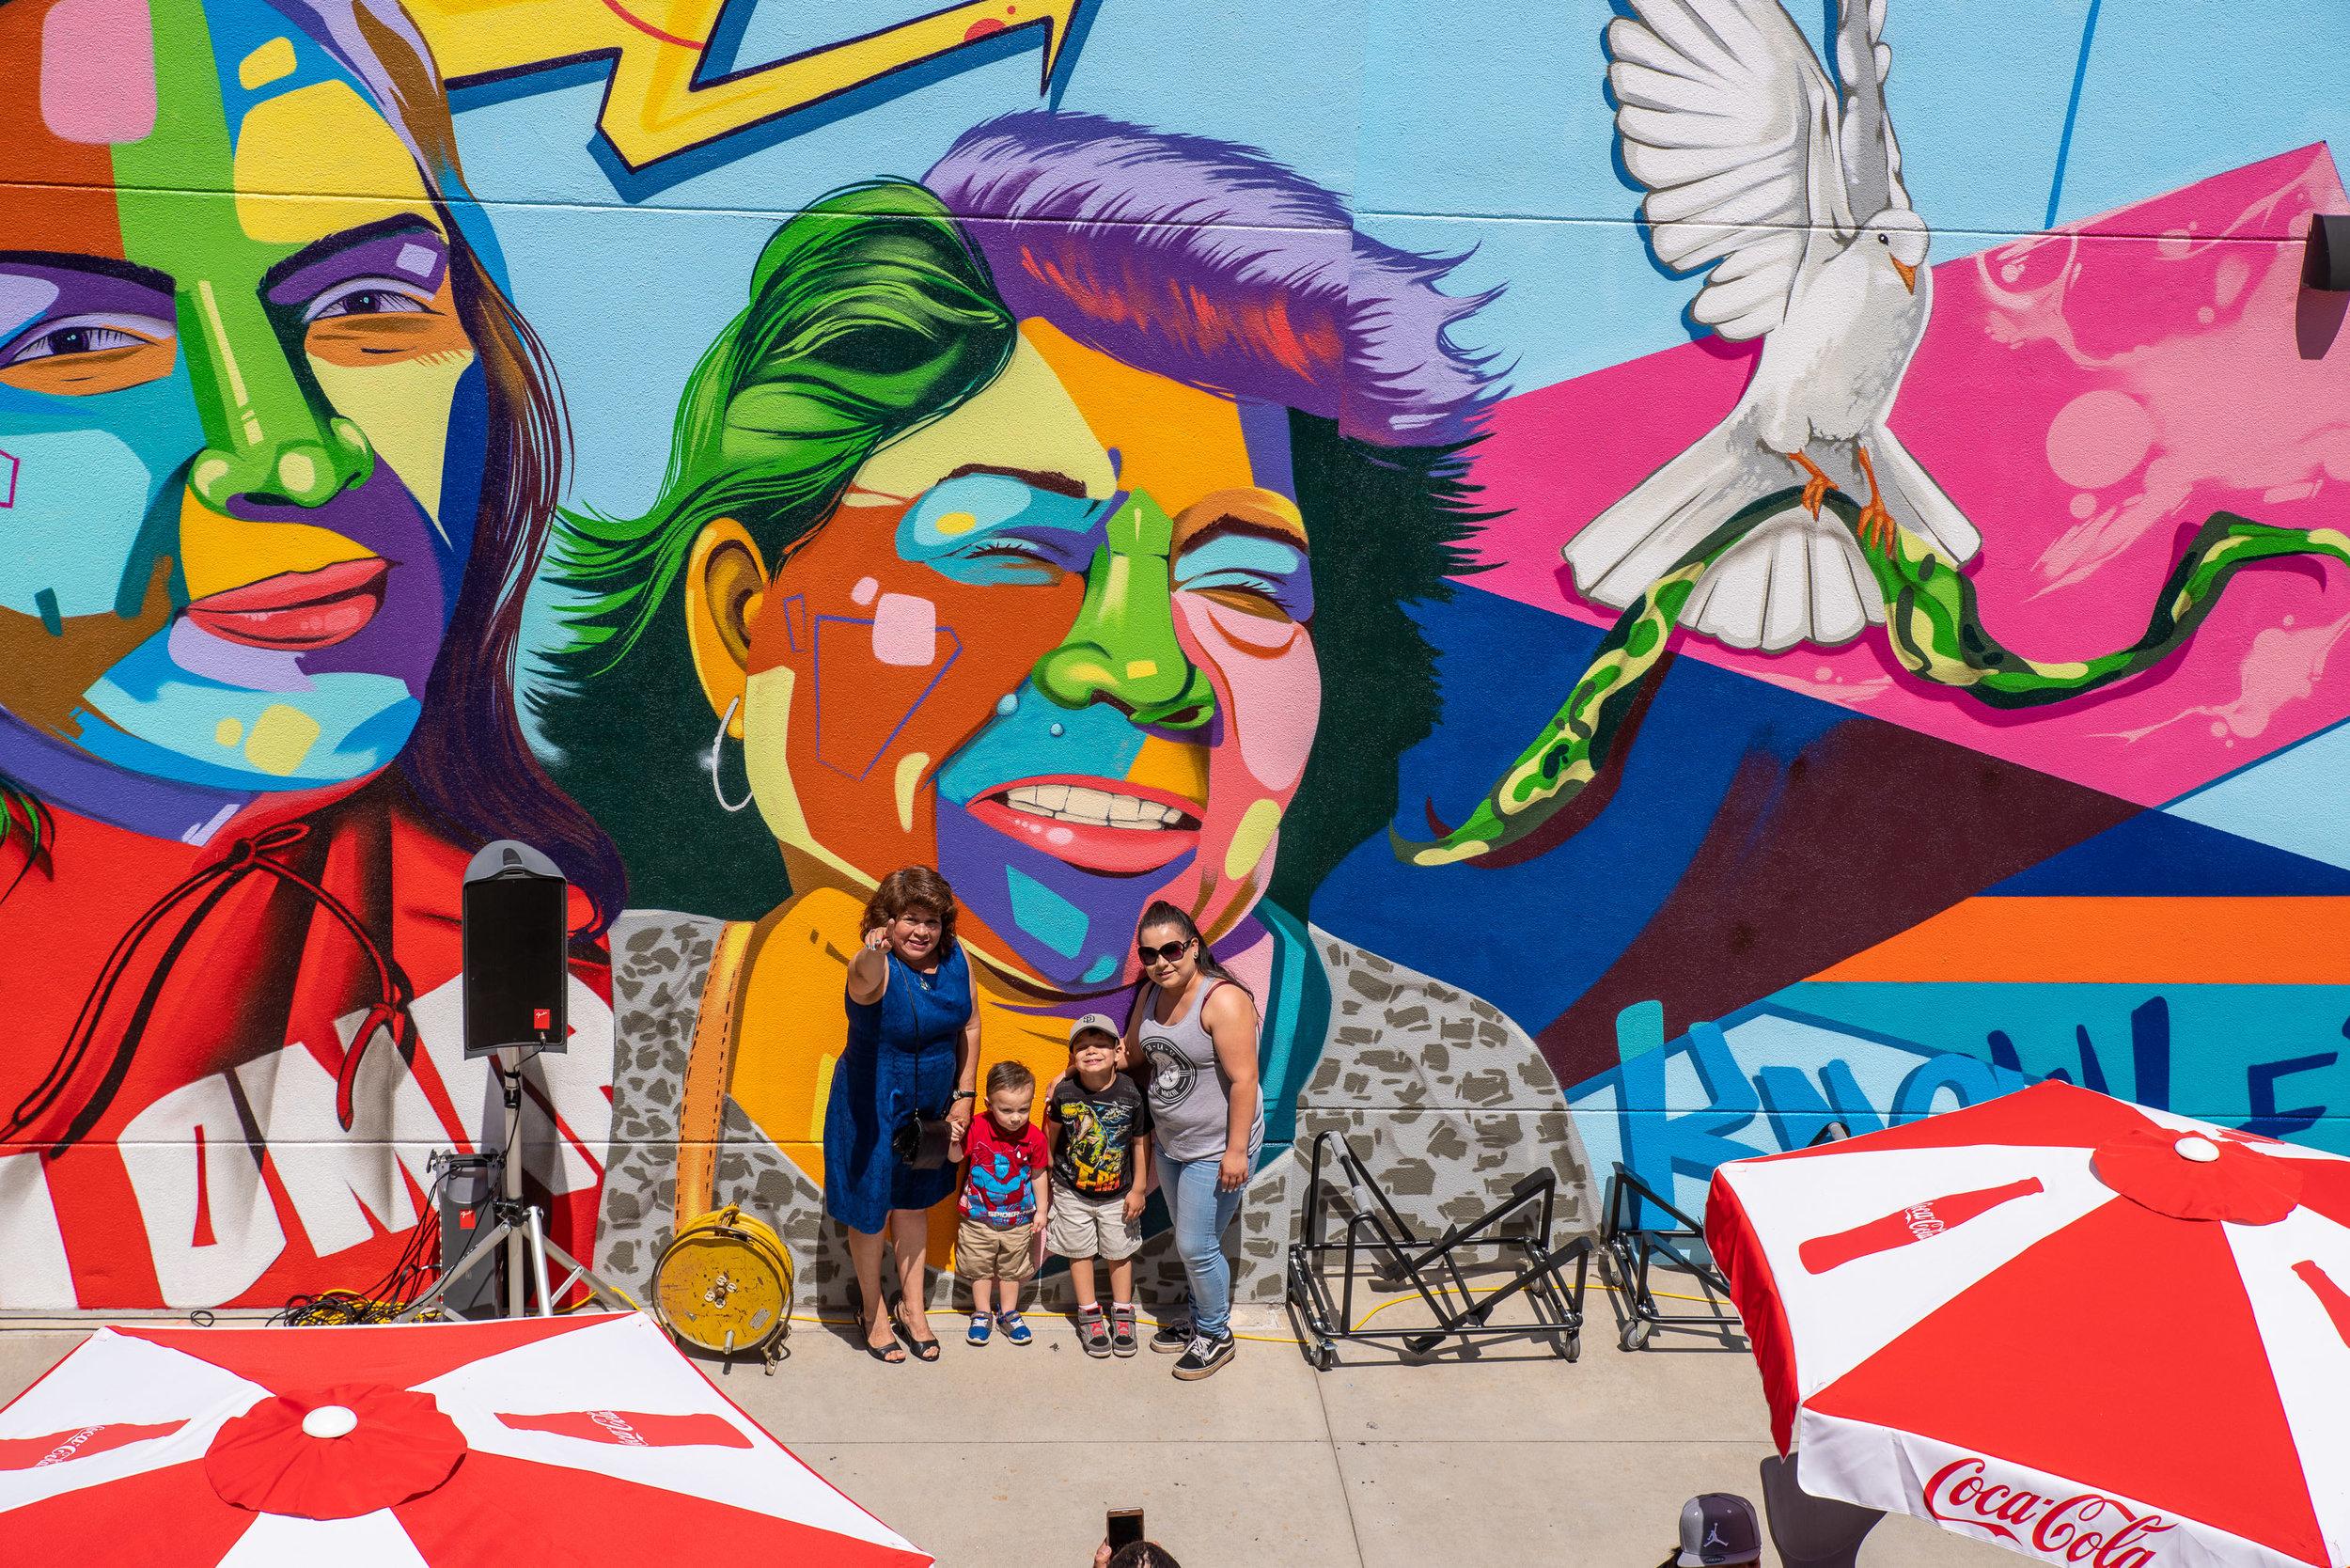 2019-05-14-man-one-mural-k-1-imgp2361_40898301243_o.jpg